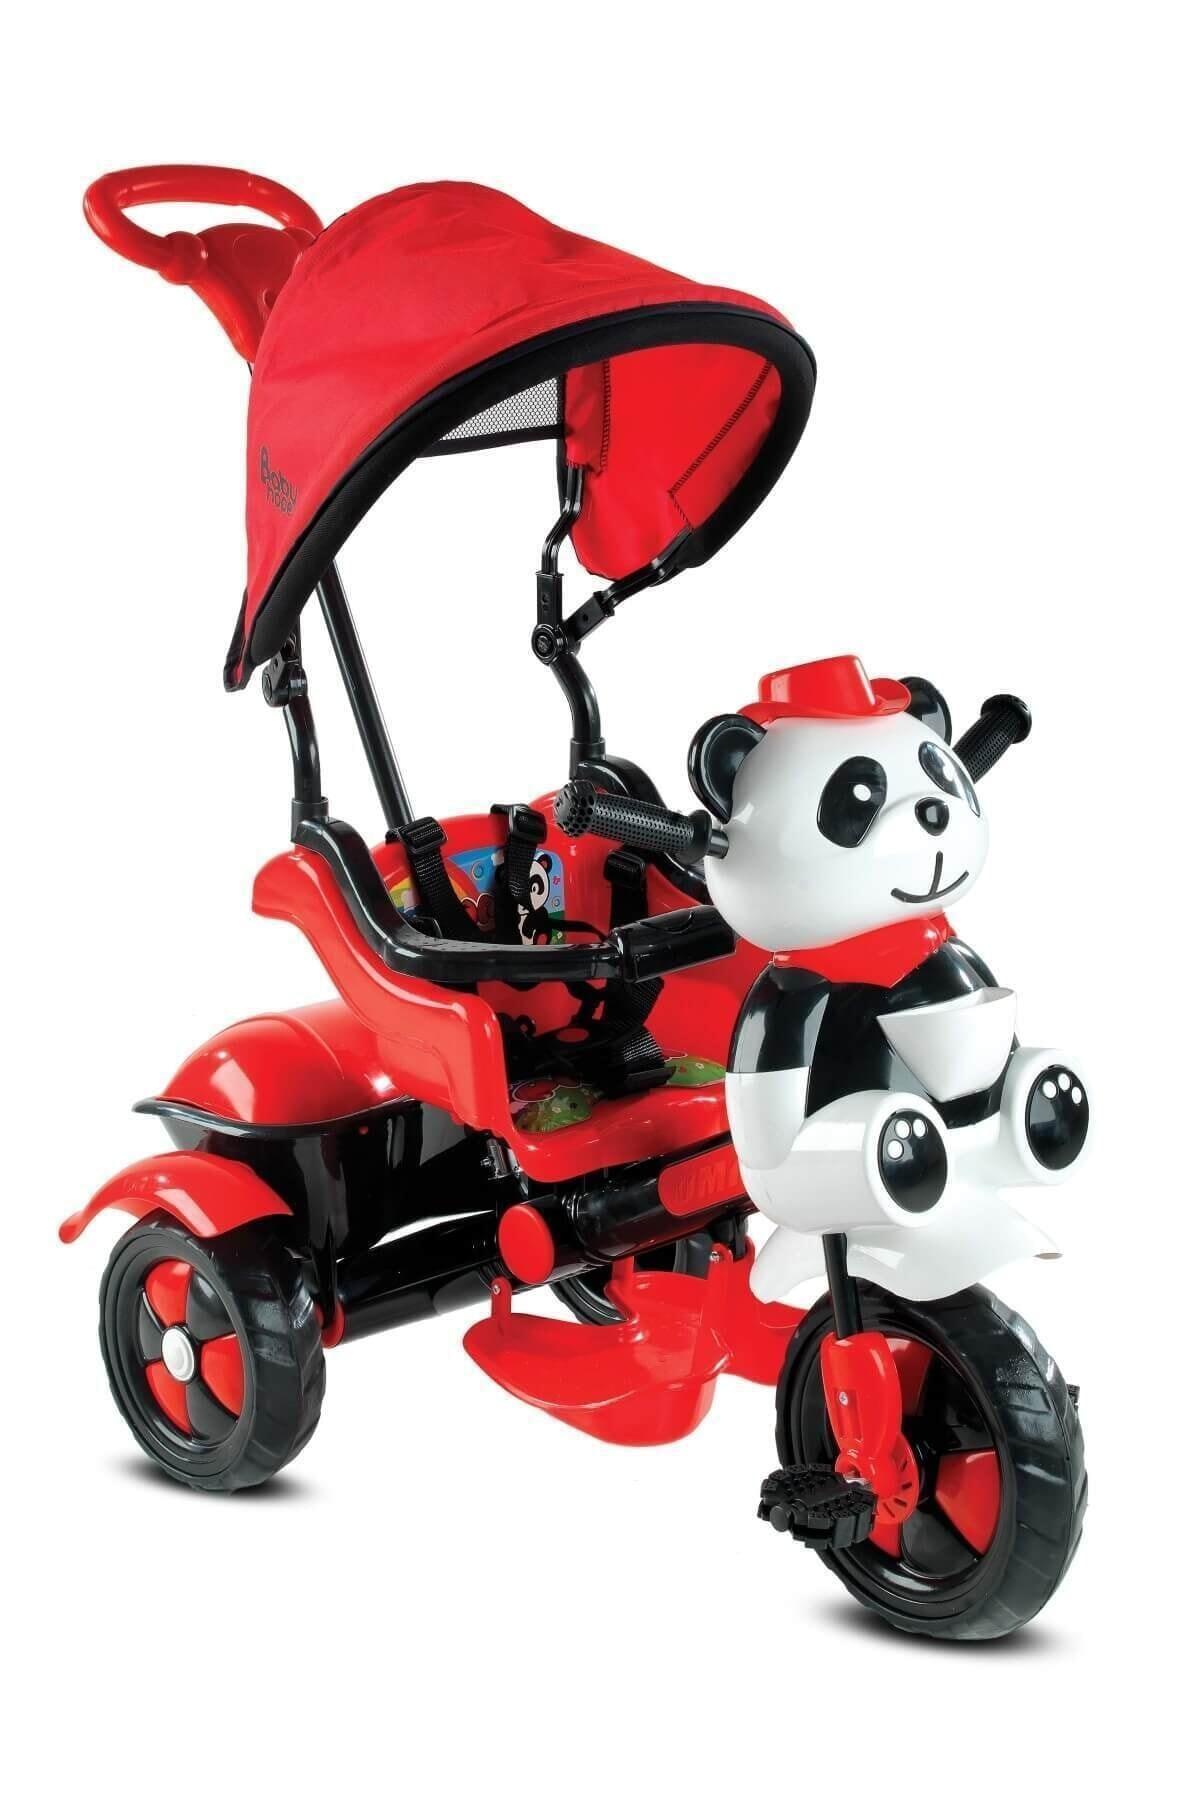 Ünalbaby 127 Little Panda 3 Tekerlekli Bisiklet 2018 /